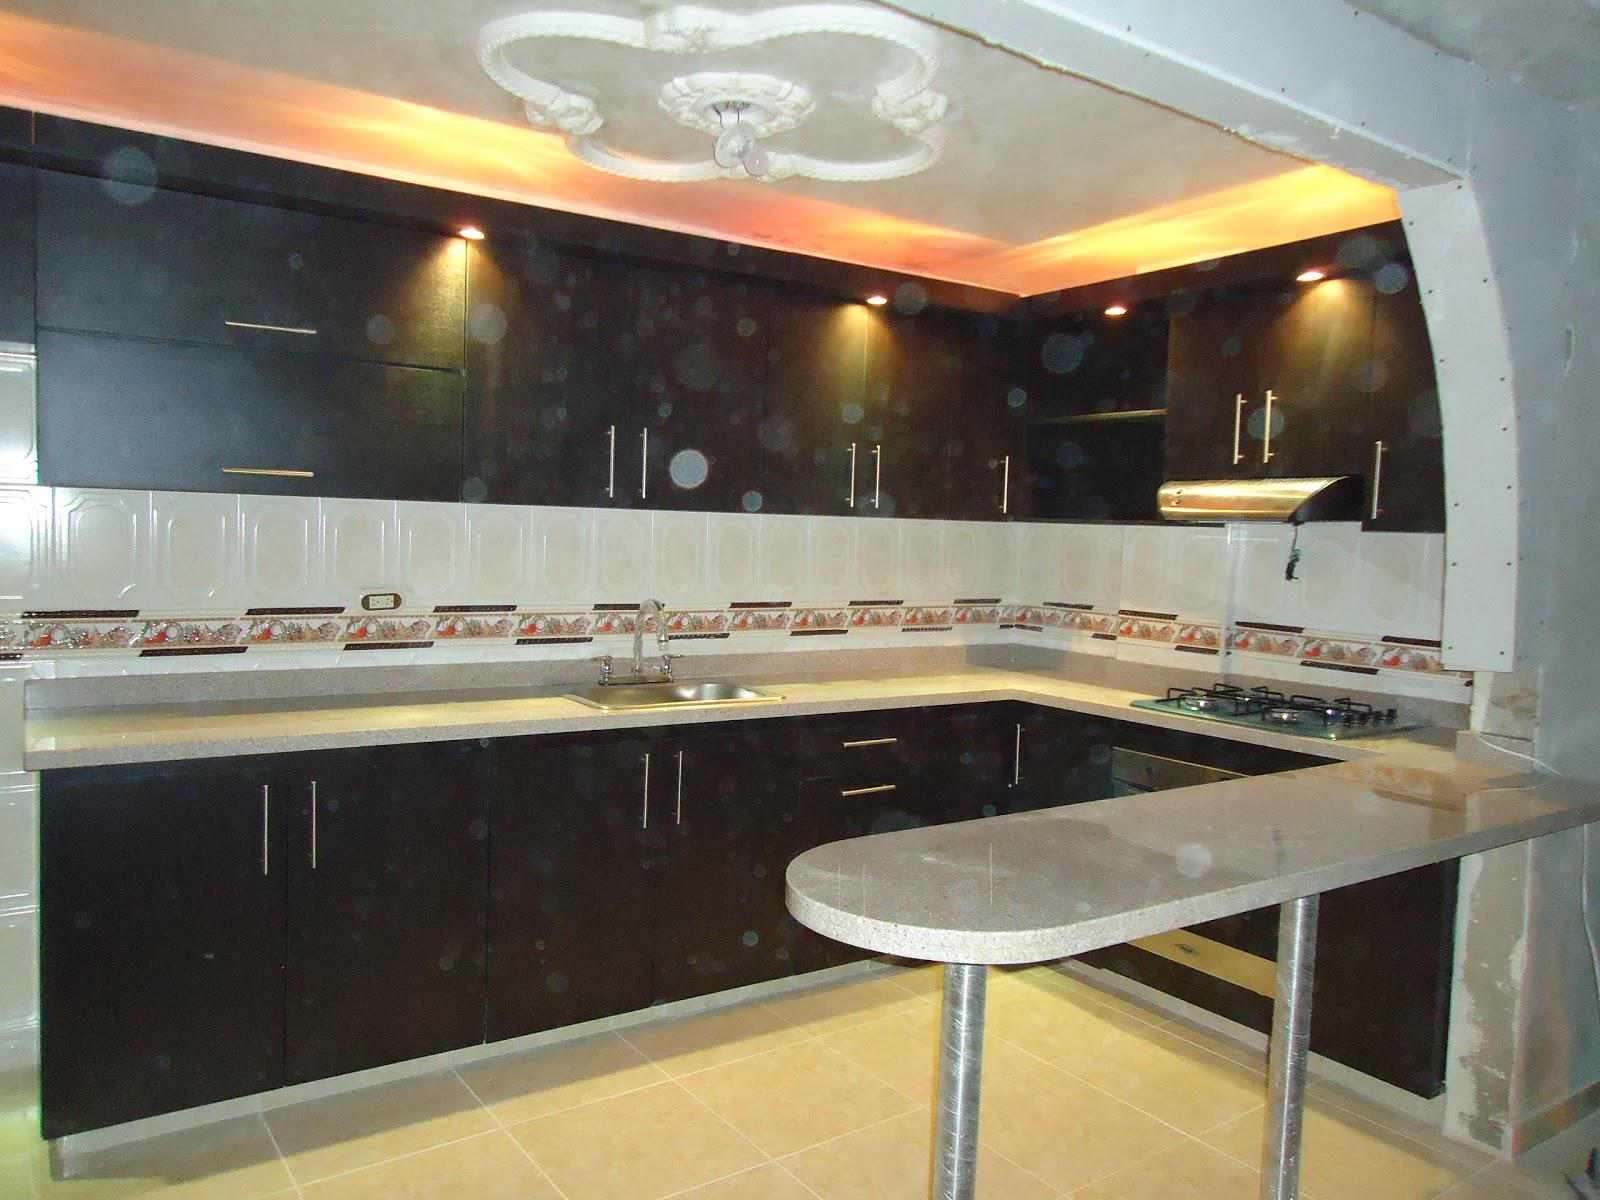 Cocinas integrales cocina completa en l con barra enn for Barras de cocina de granito